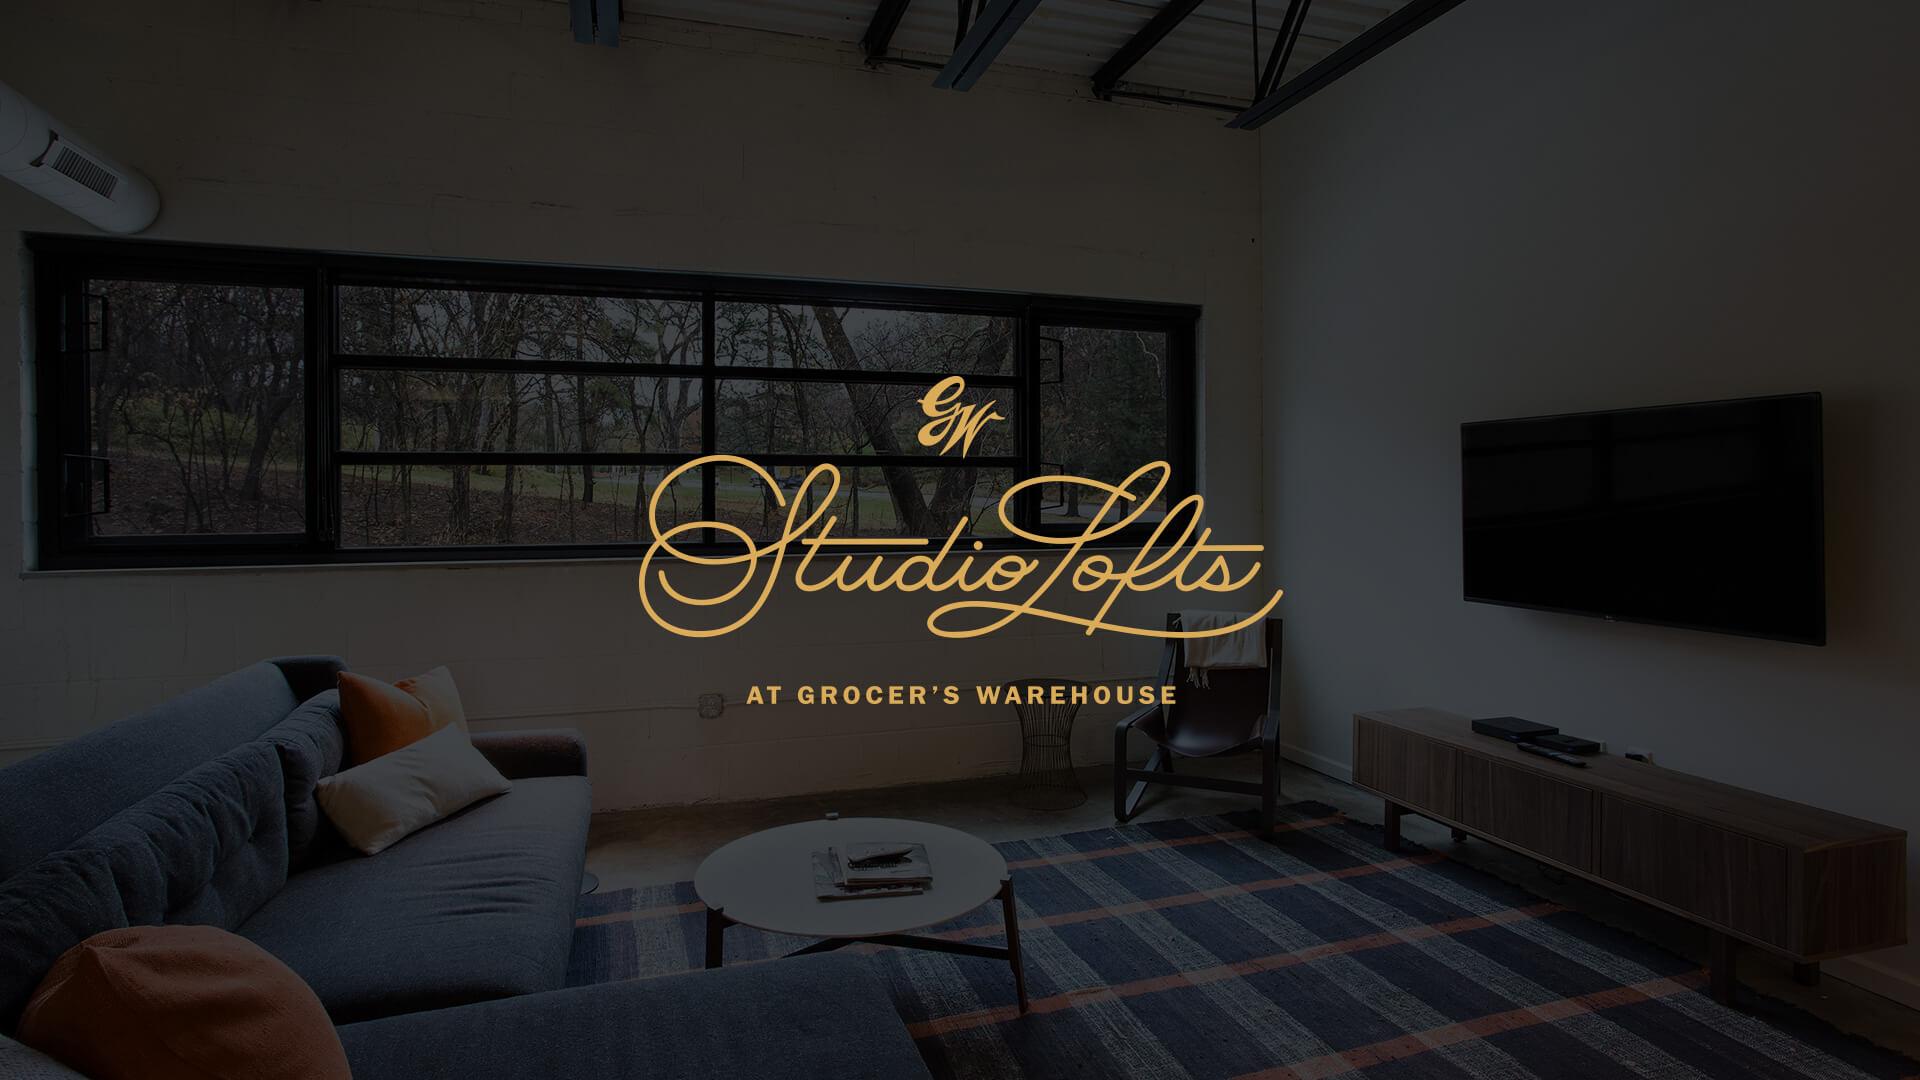 SamSmall Web-Grocers Warehouse-Studio Lofts Logo Overlay